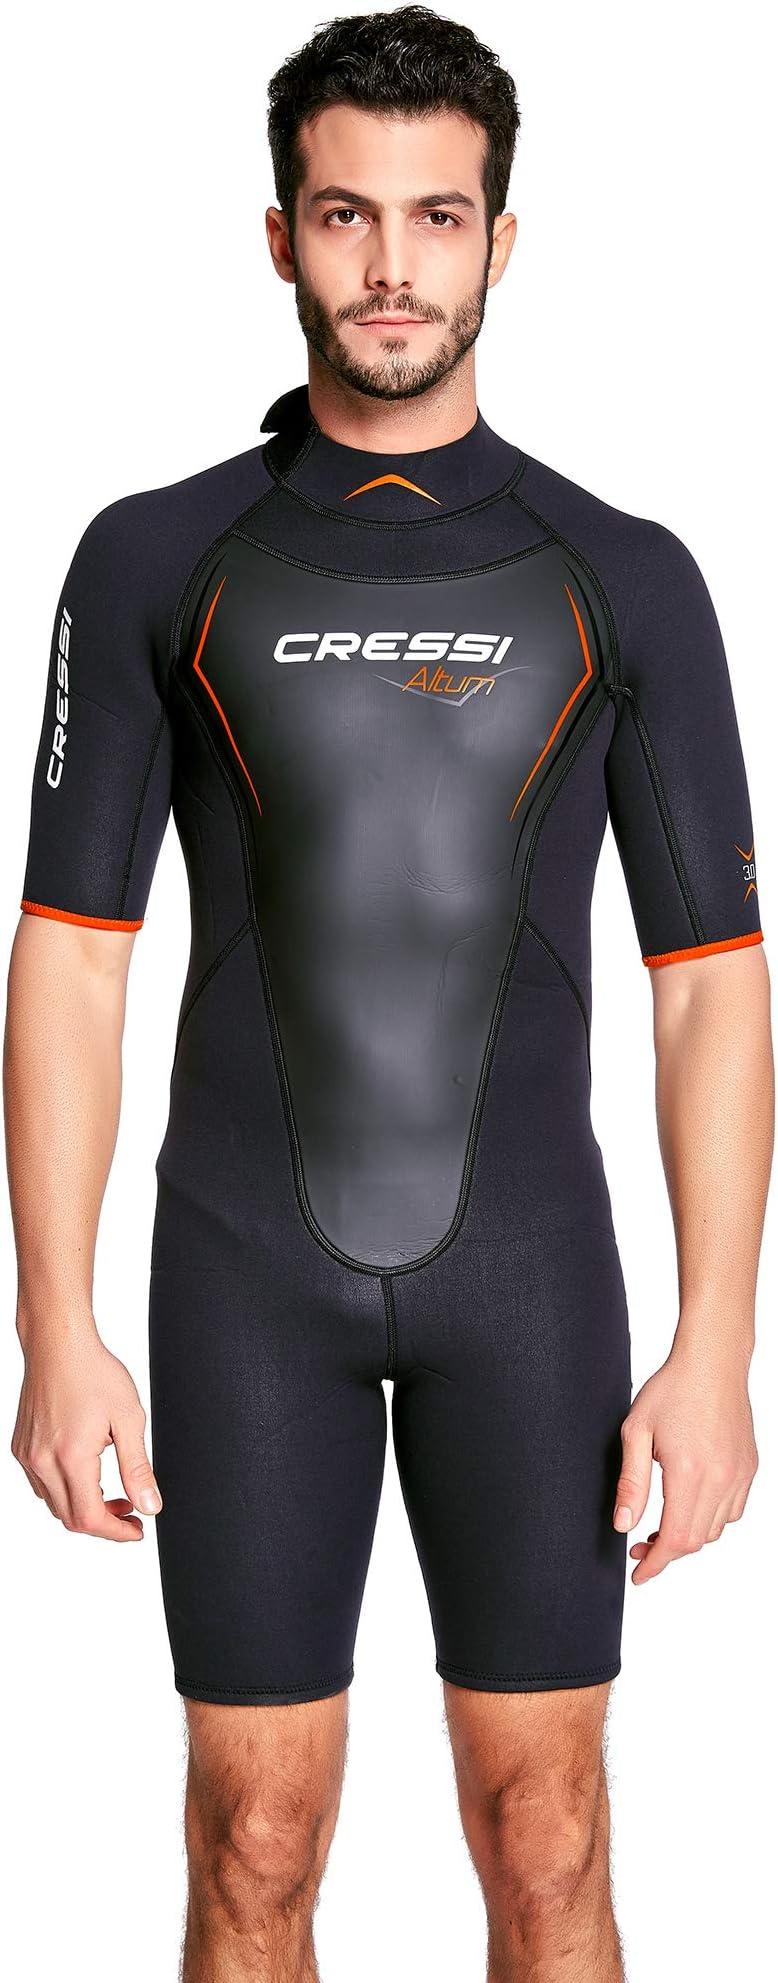 Muta shorty o monopezzo uomo  cressi altum wetsuit 3 mm XLV436047